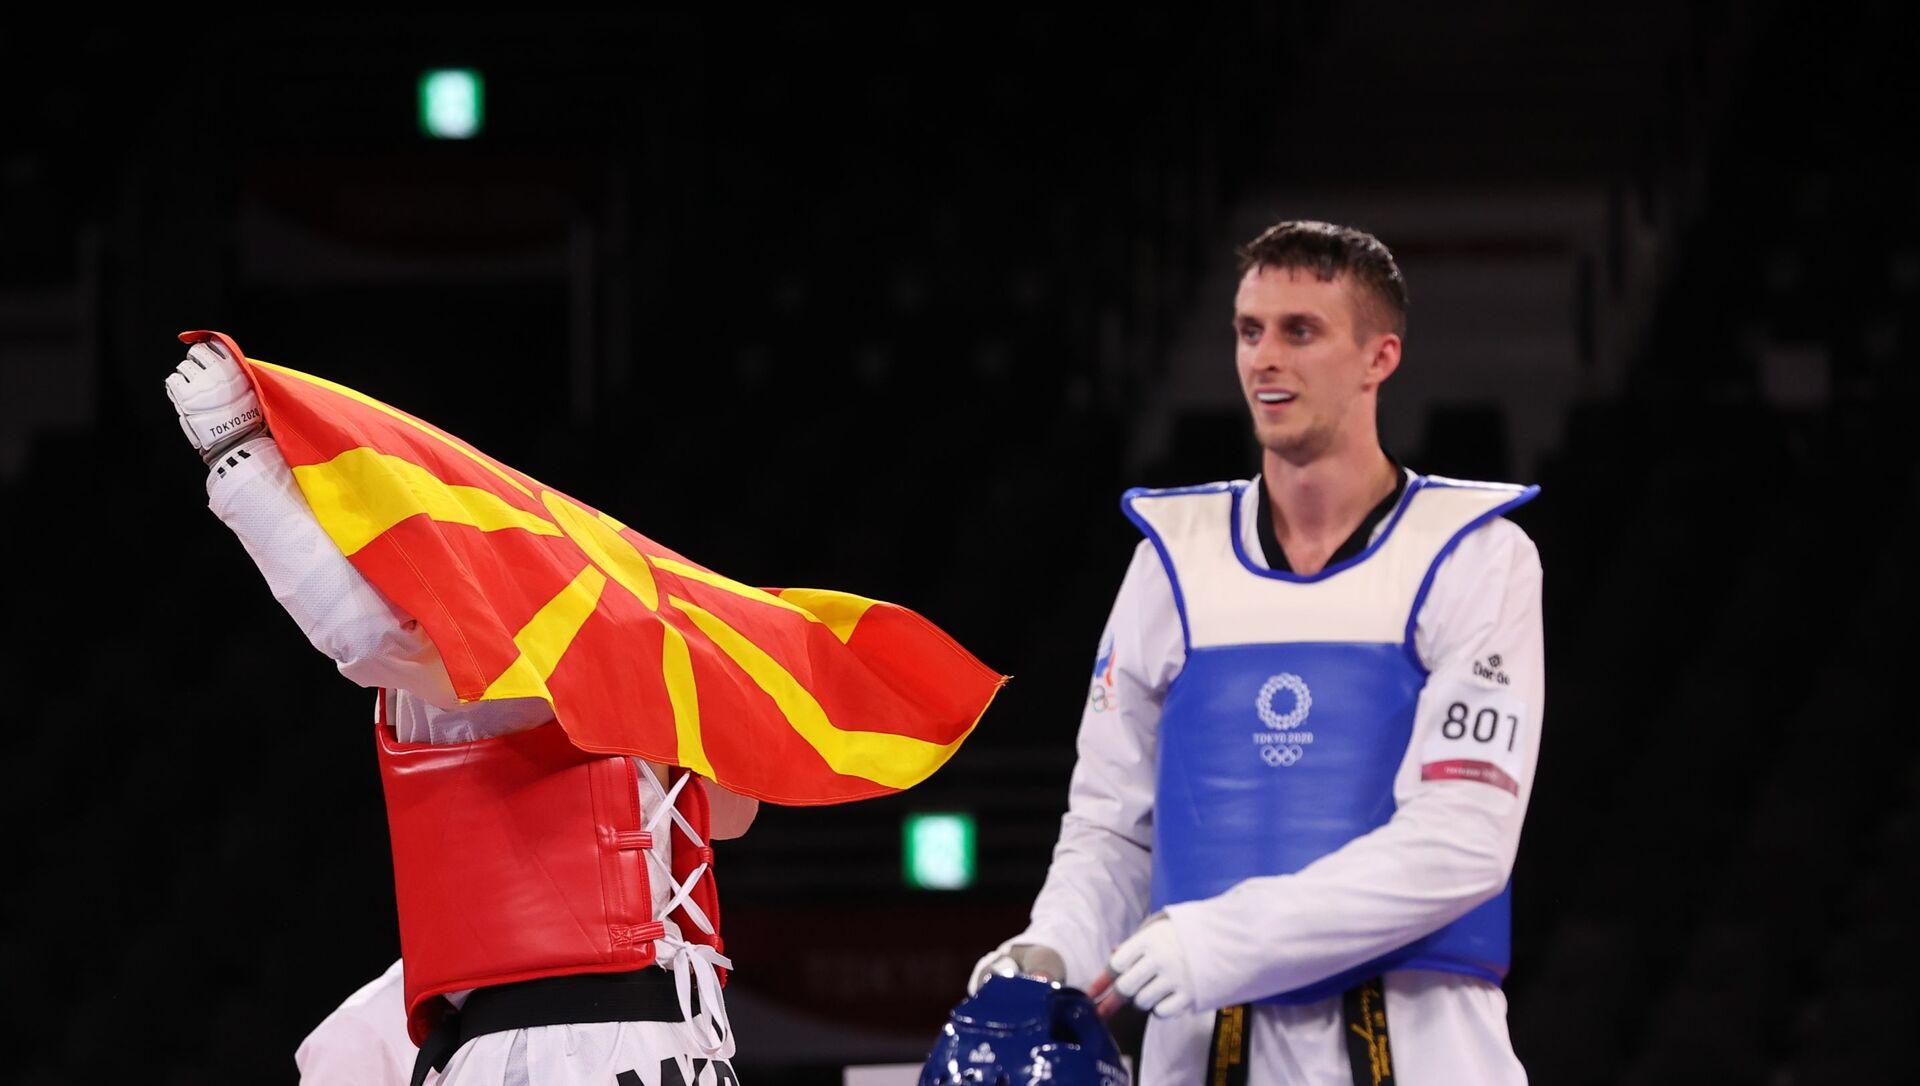 Vladislav Larin of the Russian Olympic Committee and Dejan Georgievski of North Macedonia react after competing, Taekwondo, Men's Heavyweight +80kg. July 27, 2021 - Sputnik International, 1920, 27.07.2021